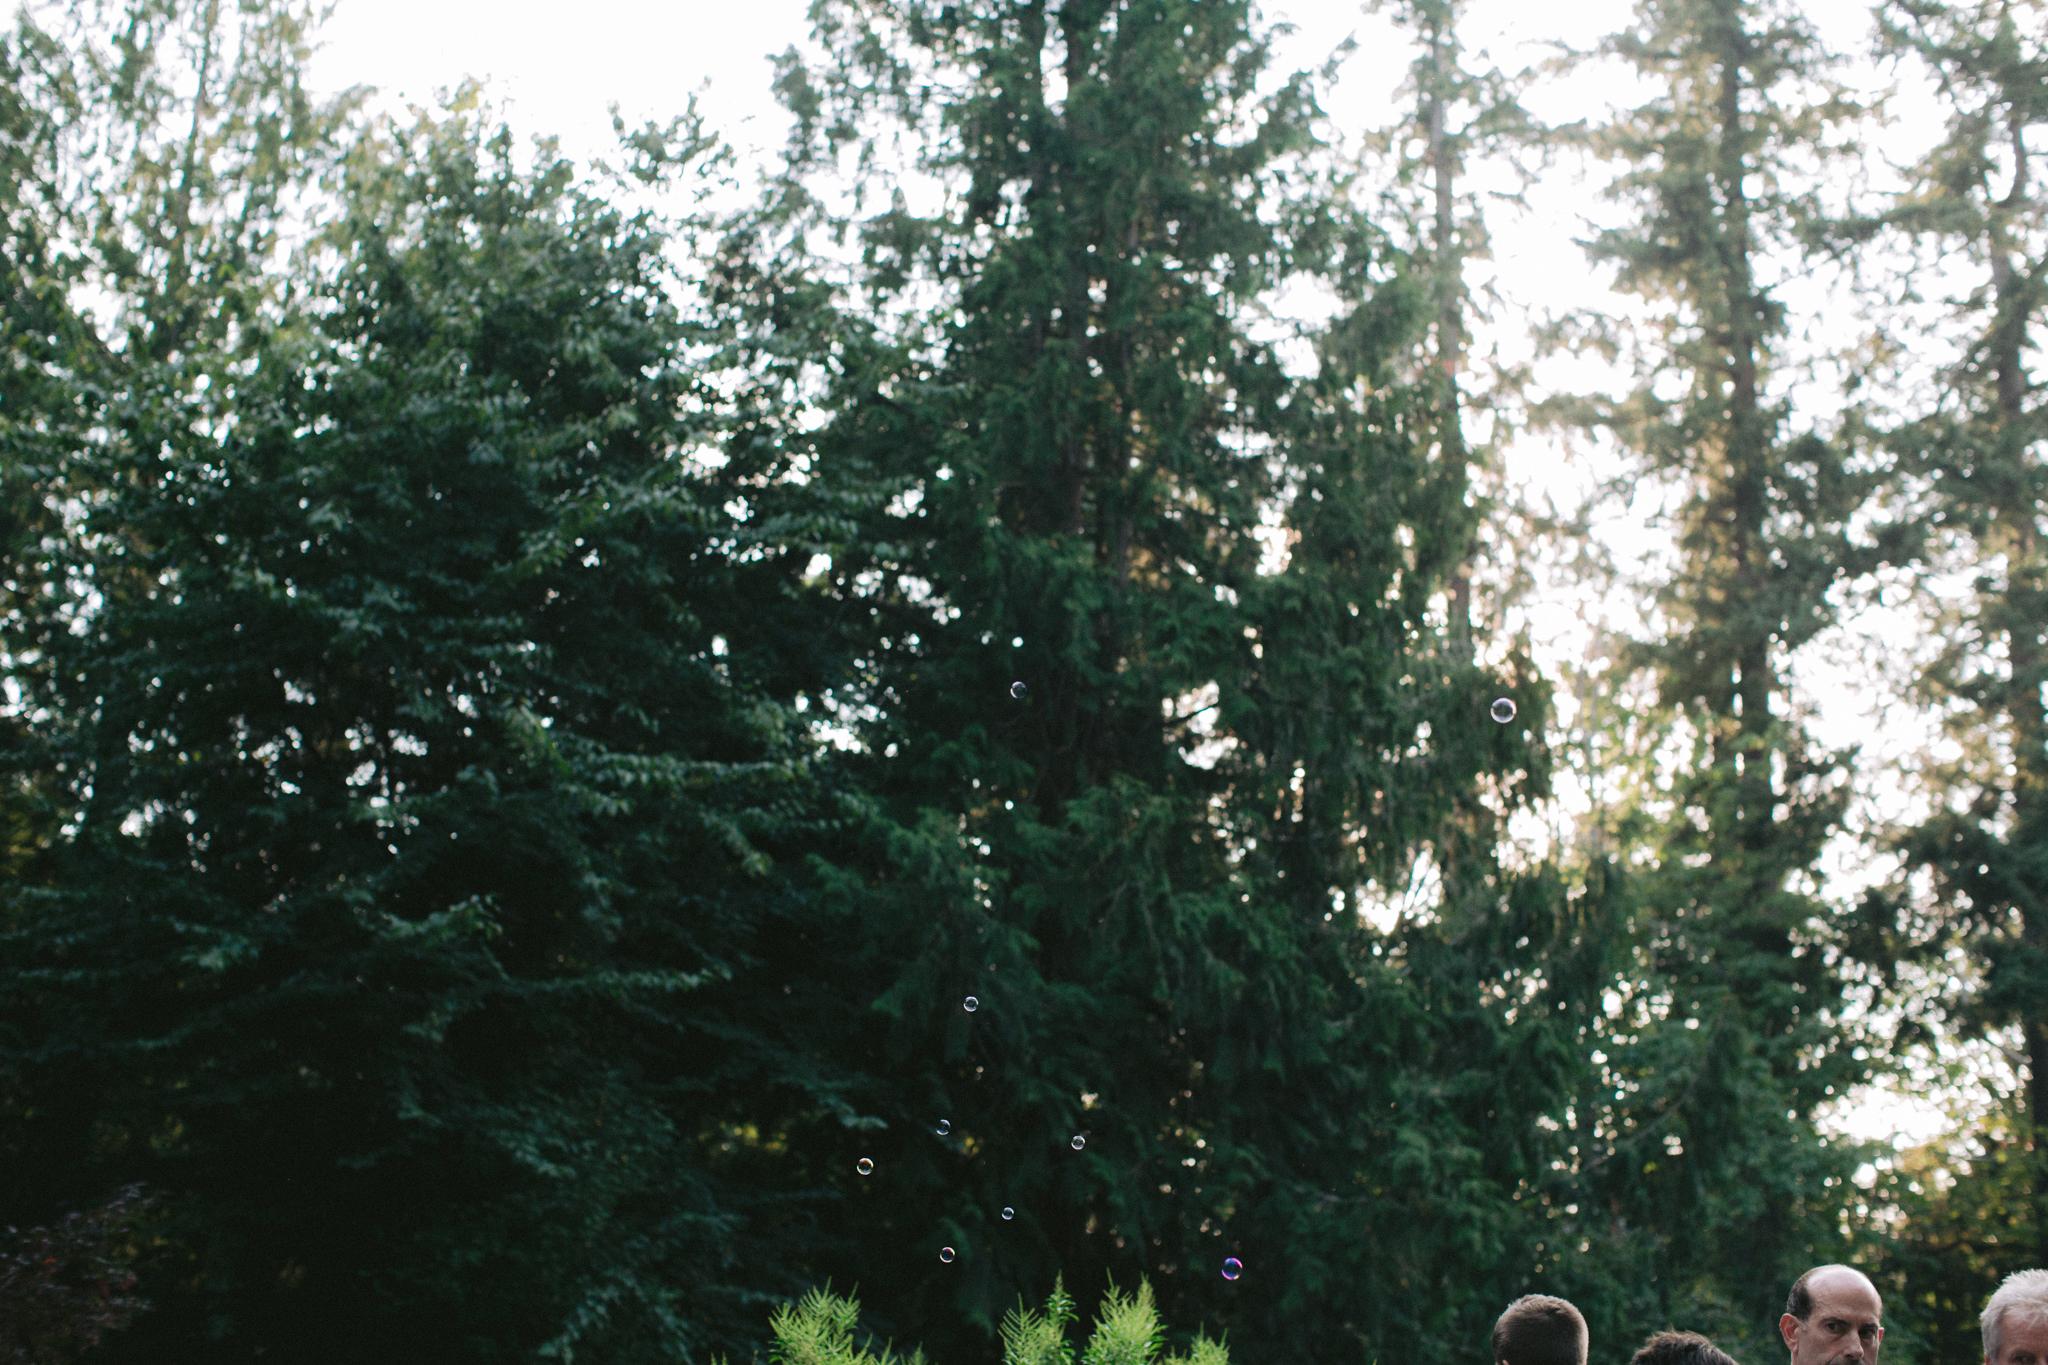 Backyard-Bainbridge-Island-Wedding-Alycia-Lovell-Photography-153.JPG